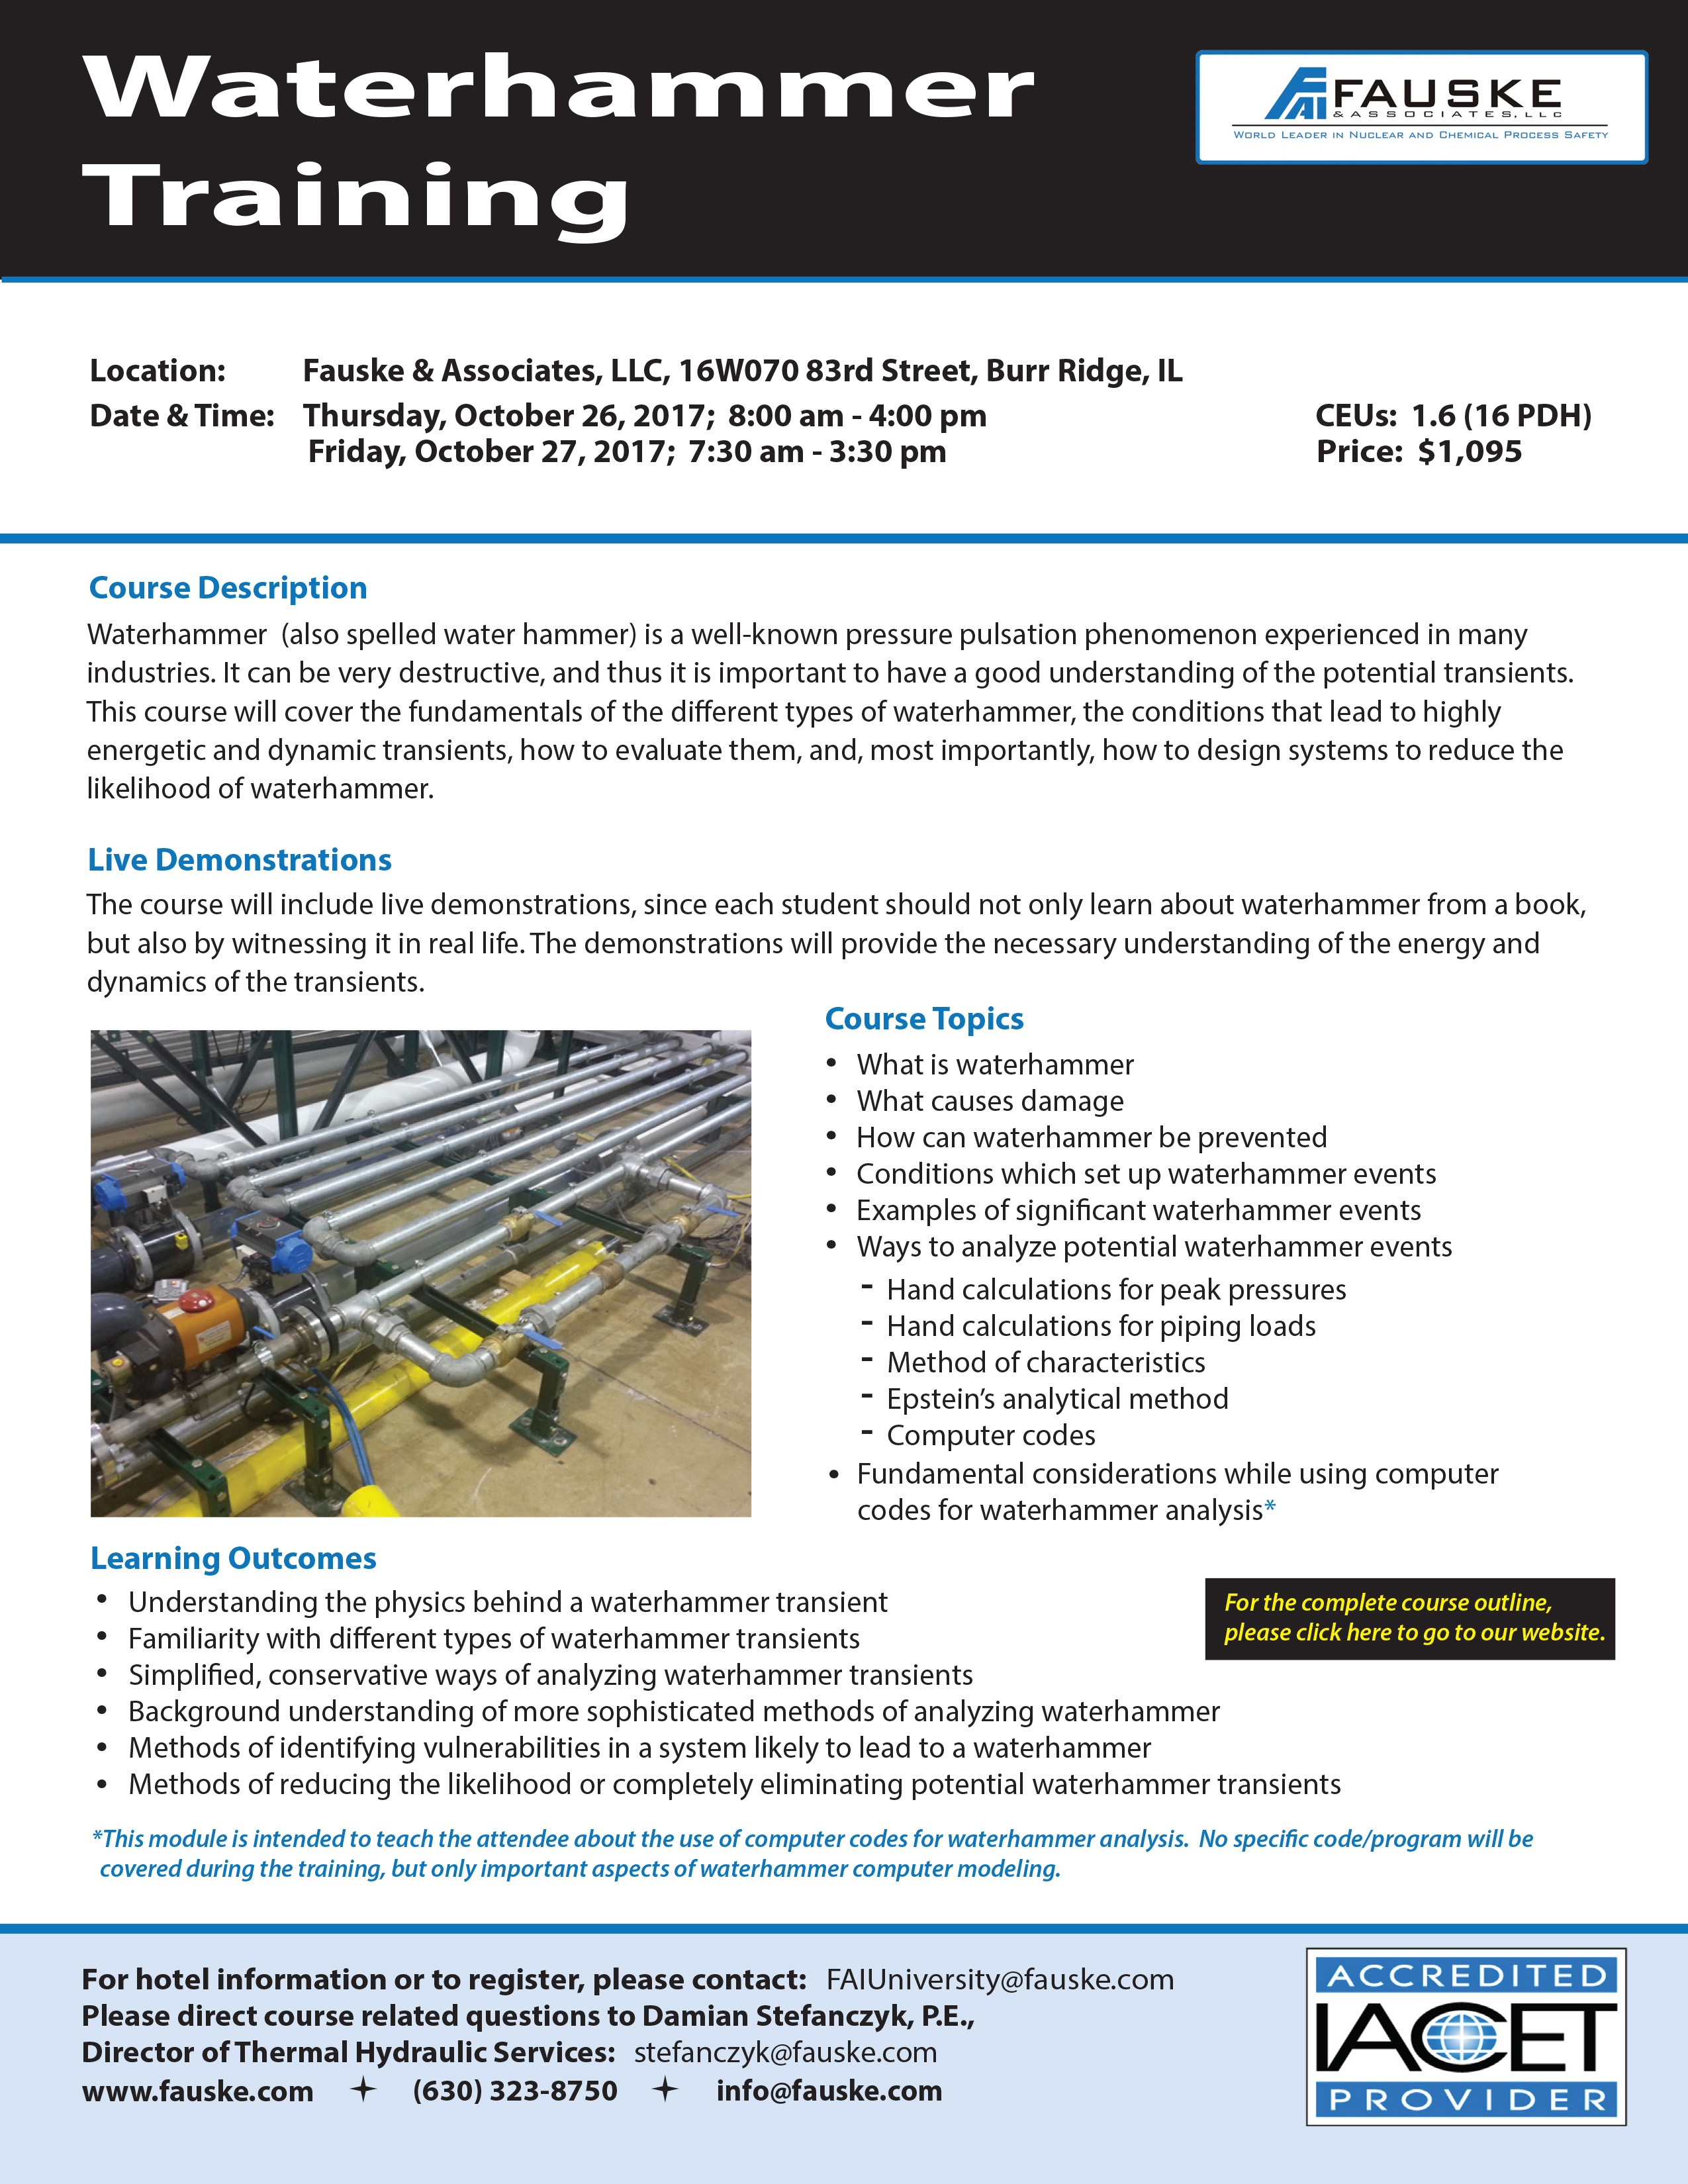 FAI Waterhammer Course Brochure